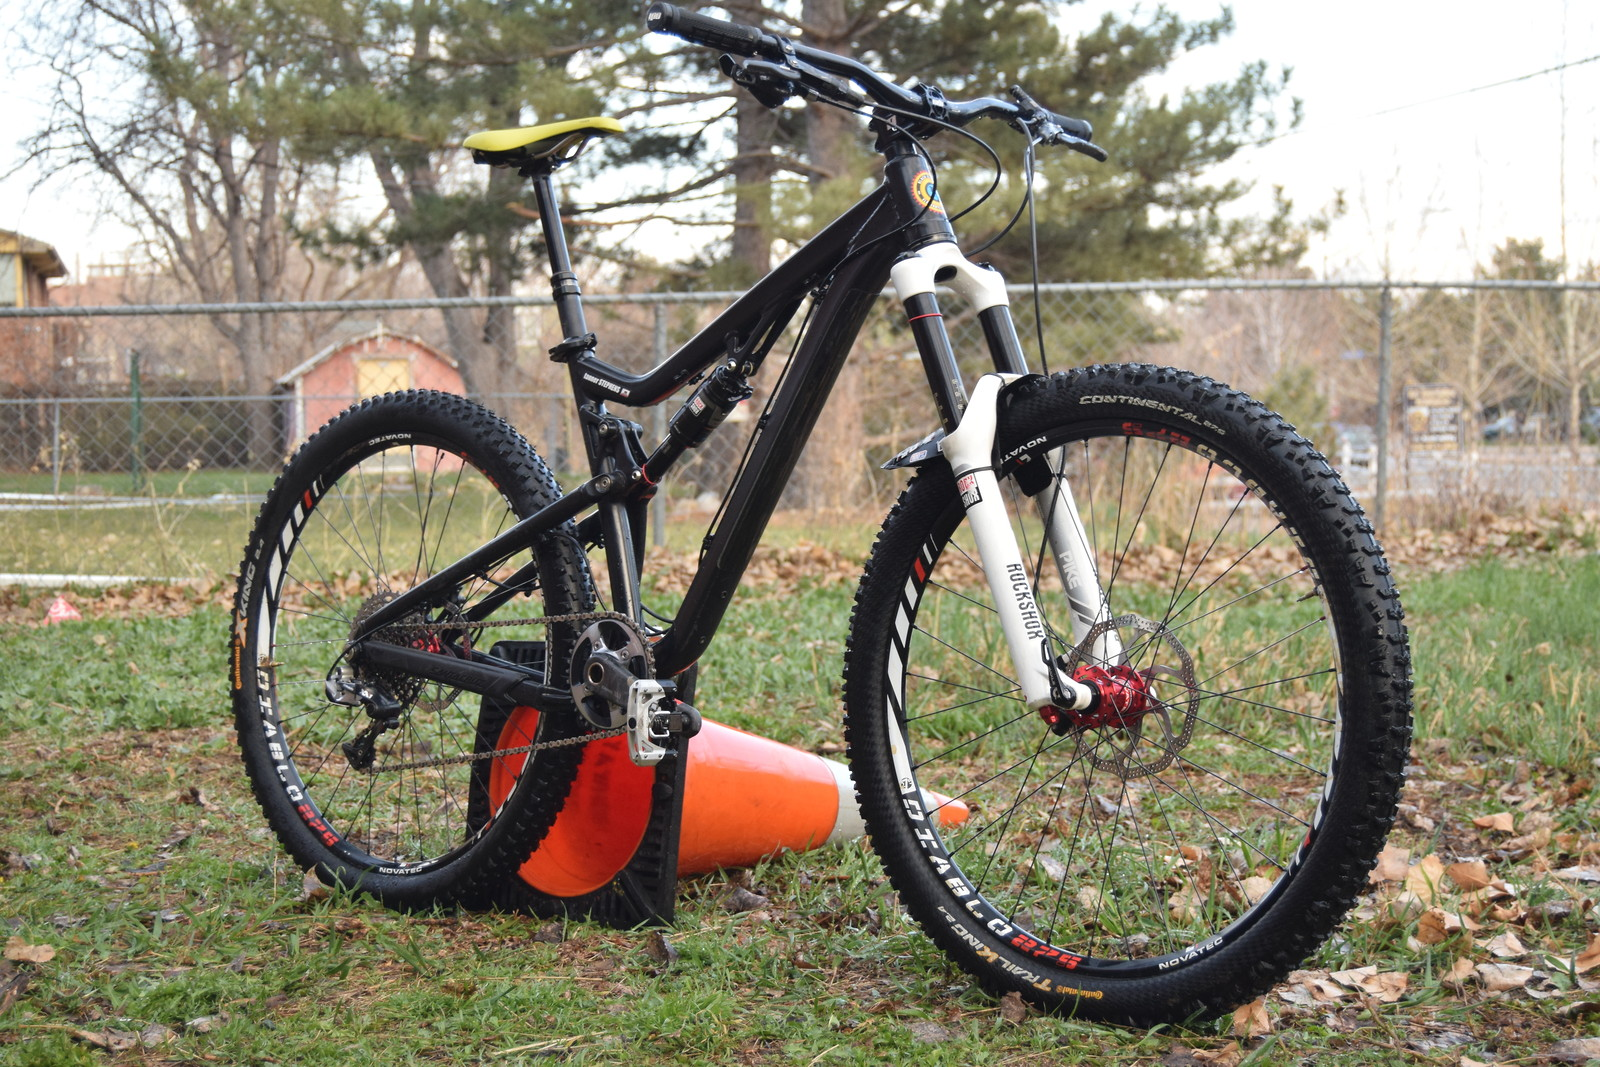 2015 factree TSRS privateer bike